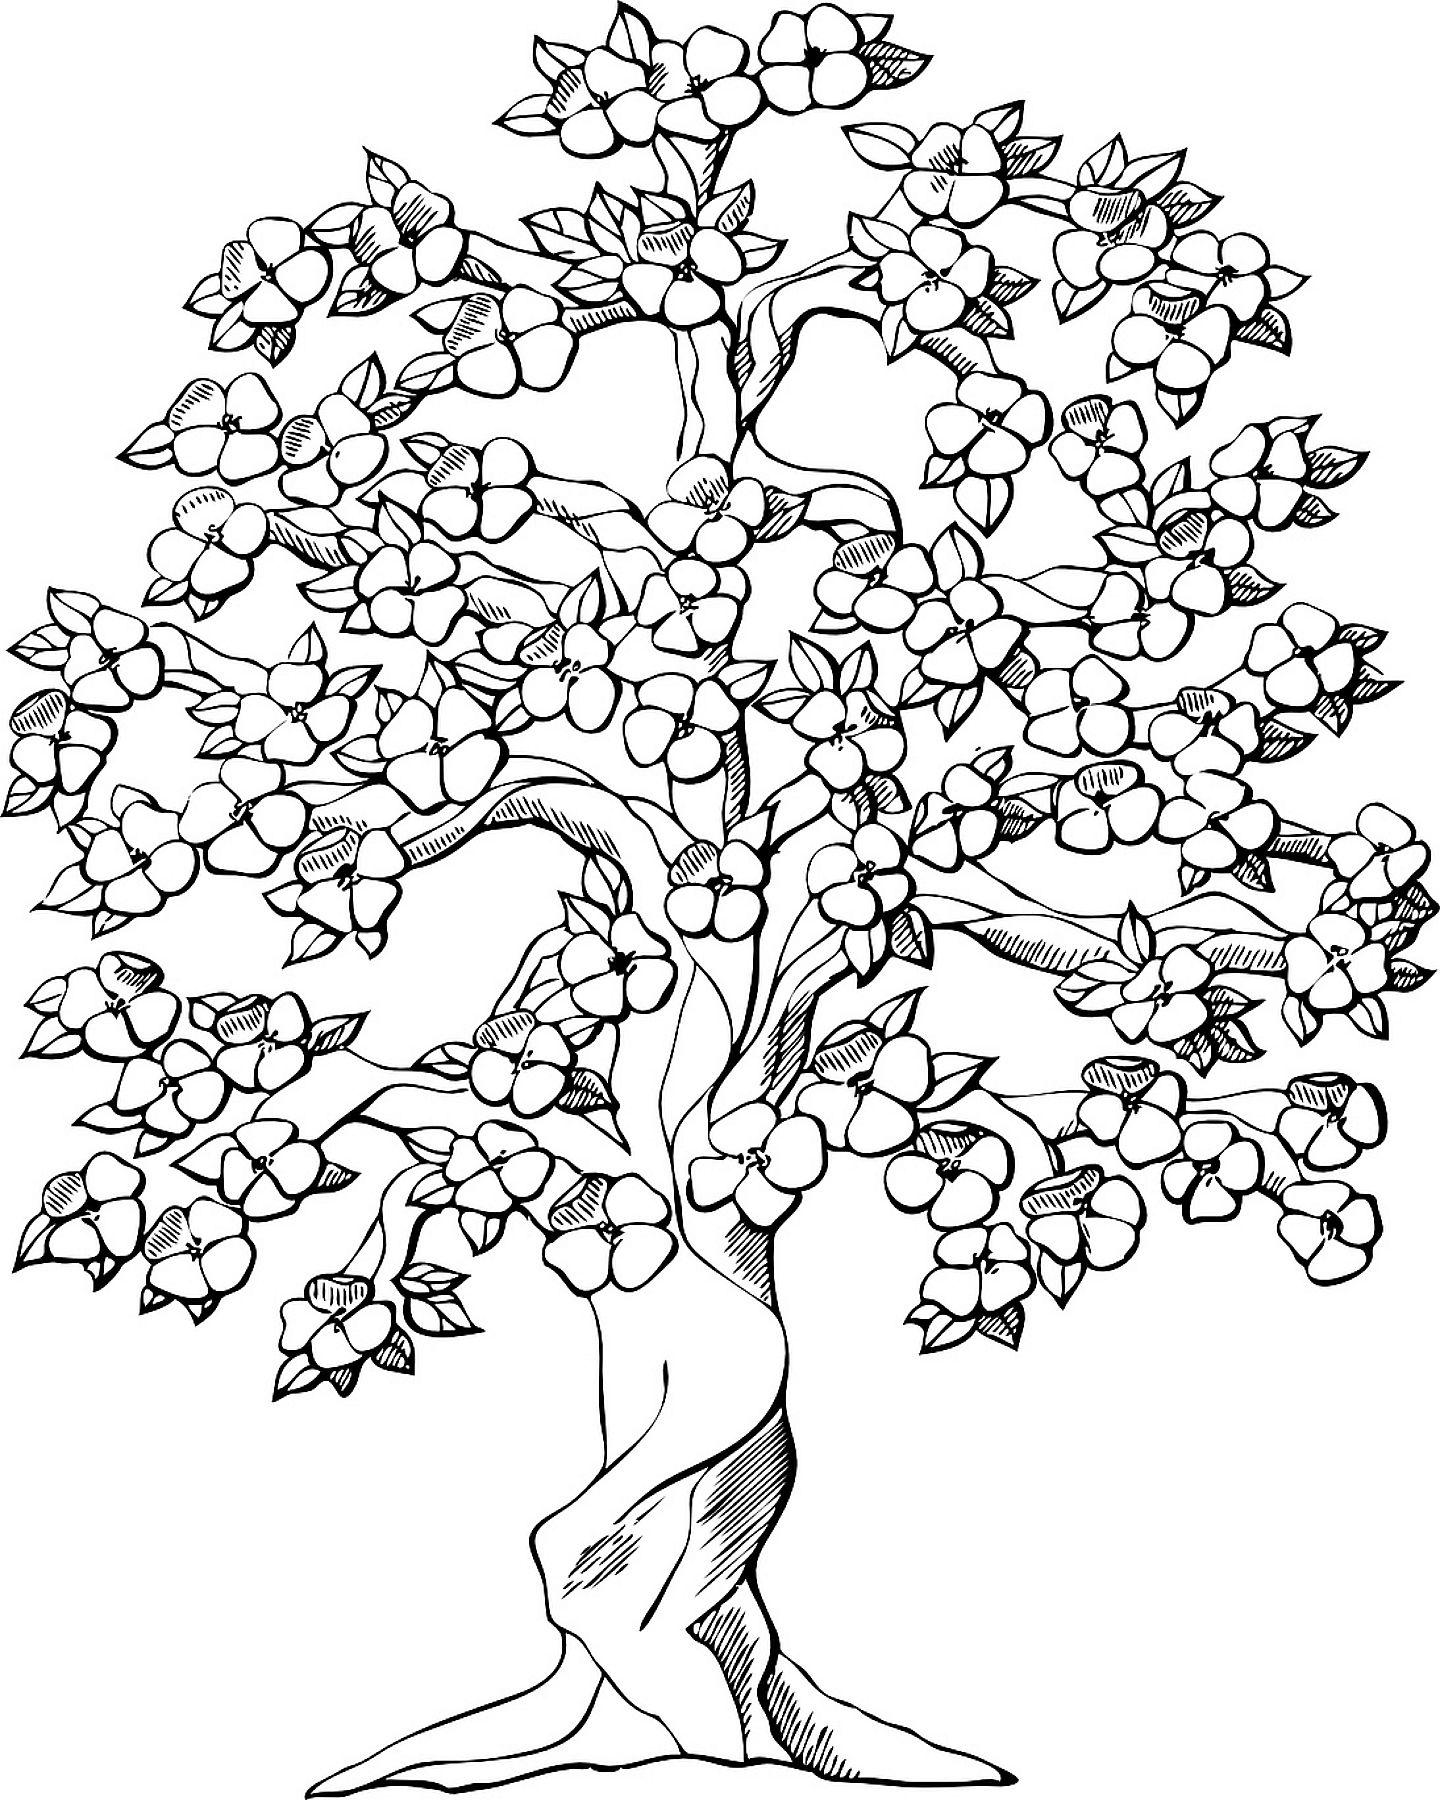 Plumeria Flowering Tree Coloring Page Tree Coloring Page Flower Coloring Pages Coloring Pages